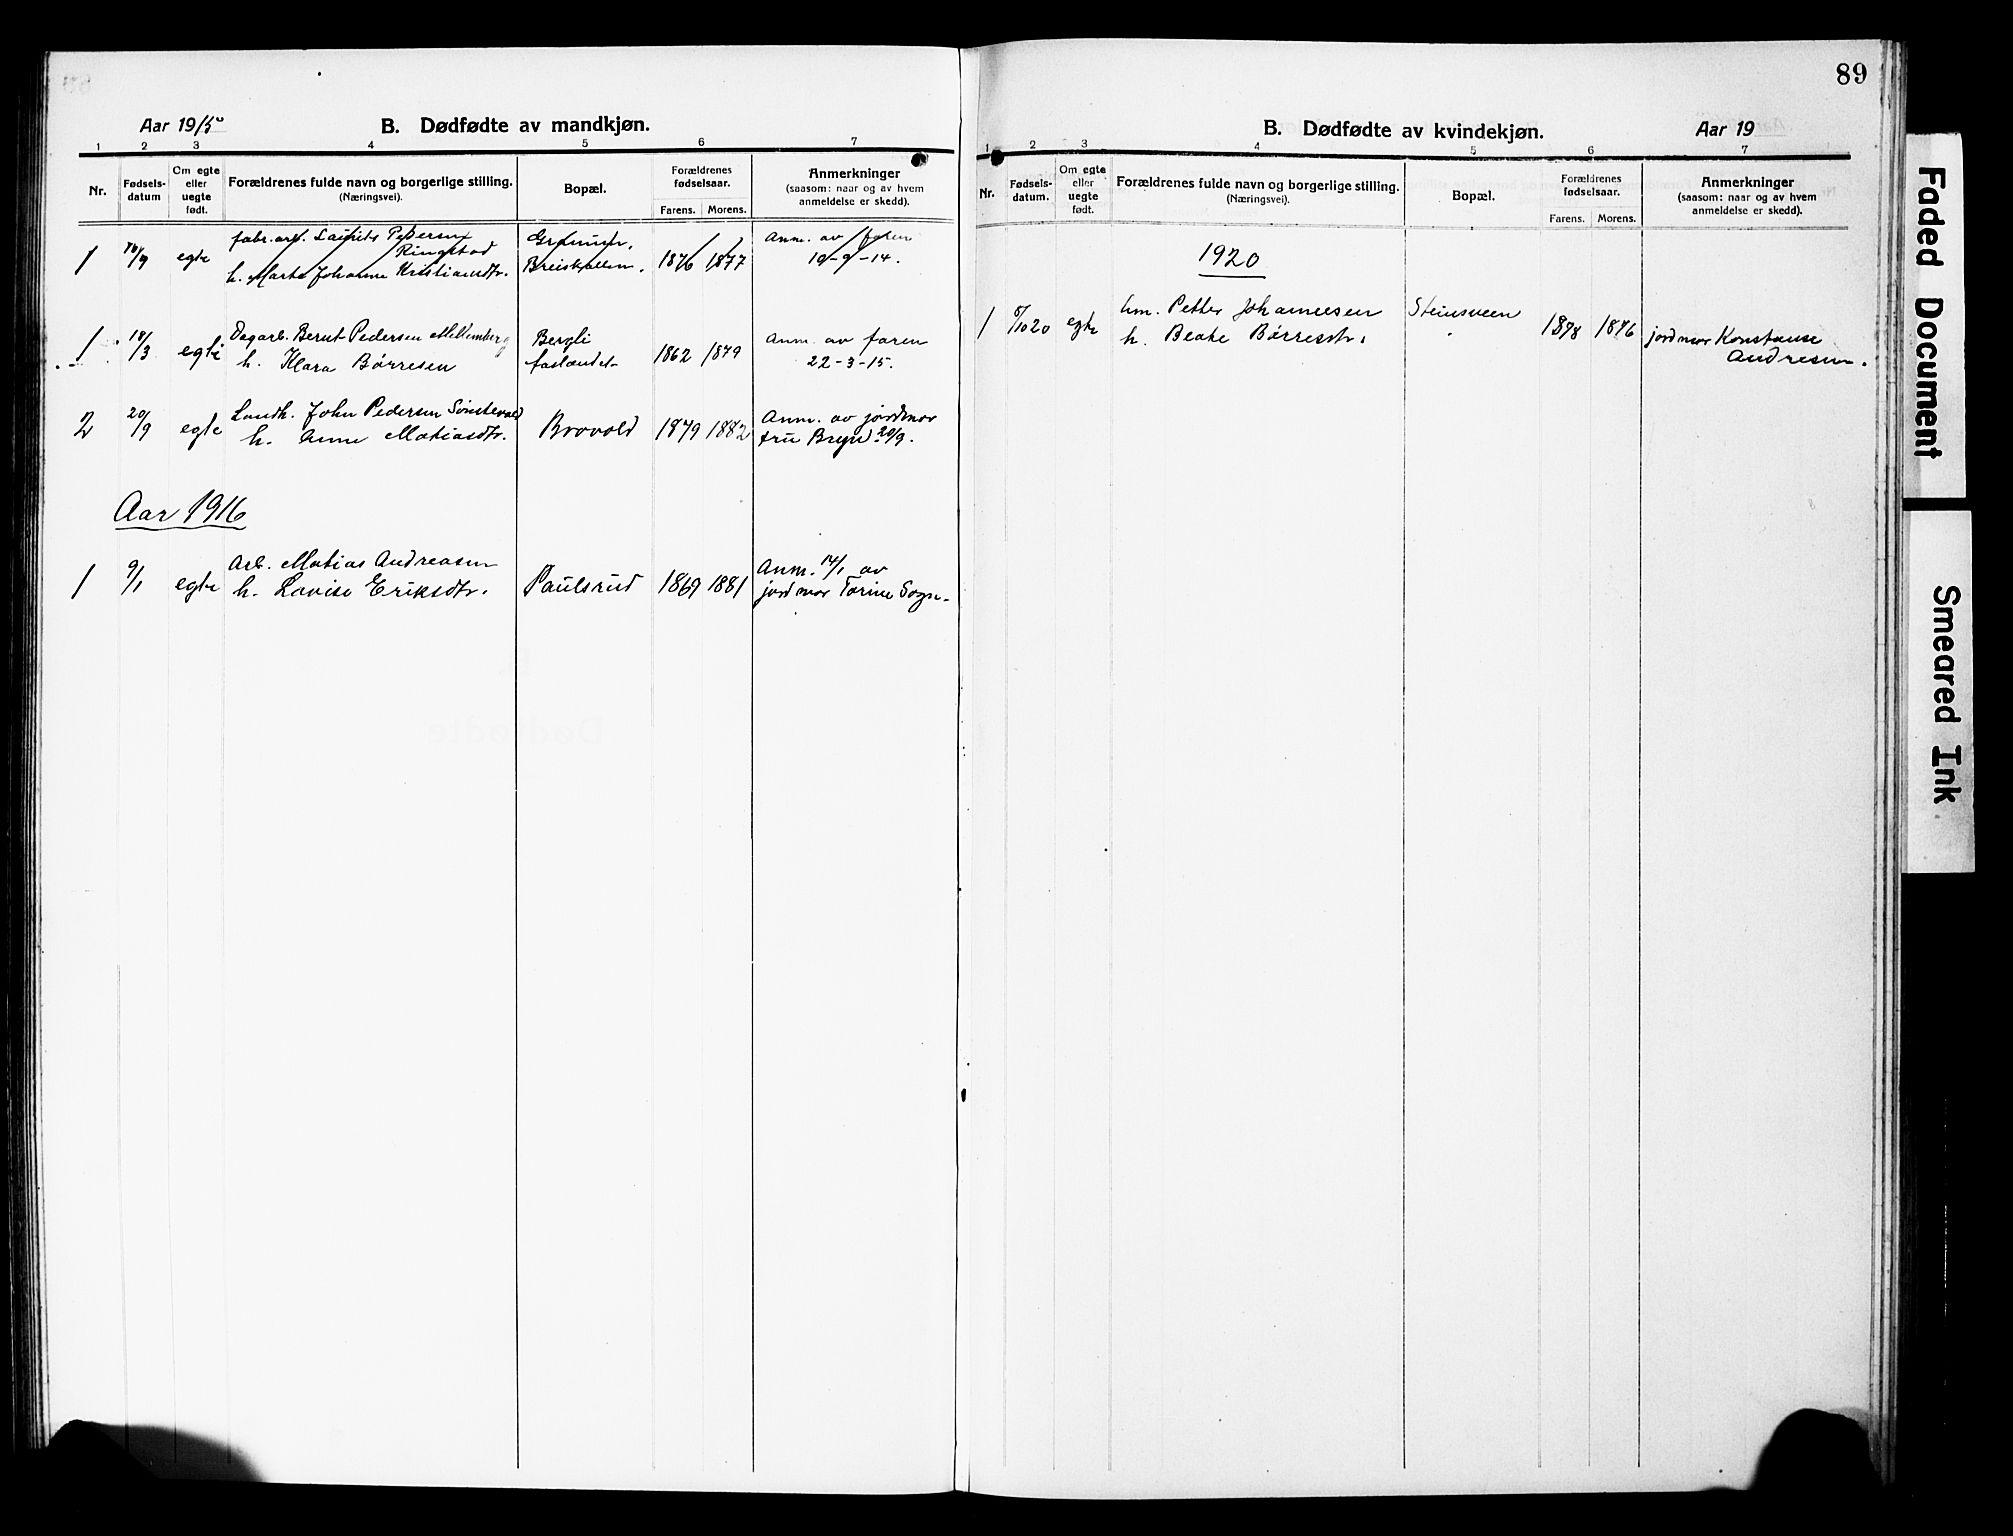 SAH, Vardal prestekontor, H/Ha/Hab/L0015: Klokkerbok nr. 15, 1914-1931, s. 89